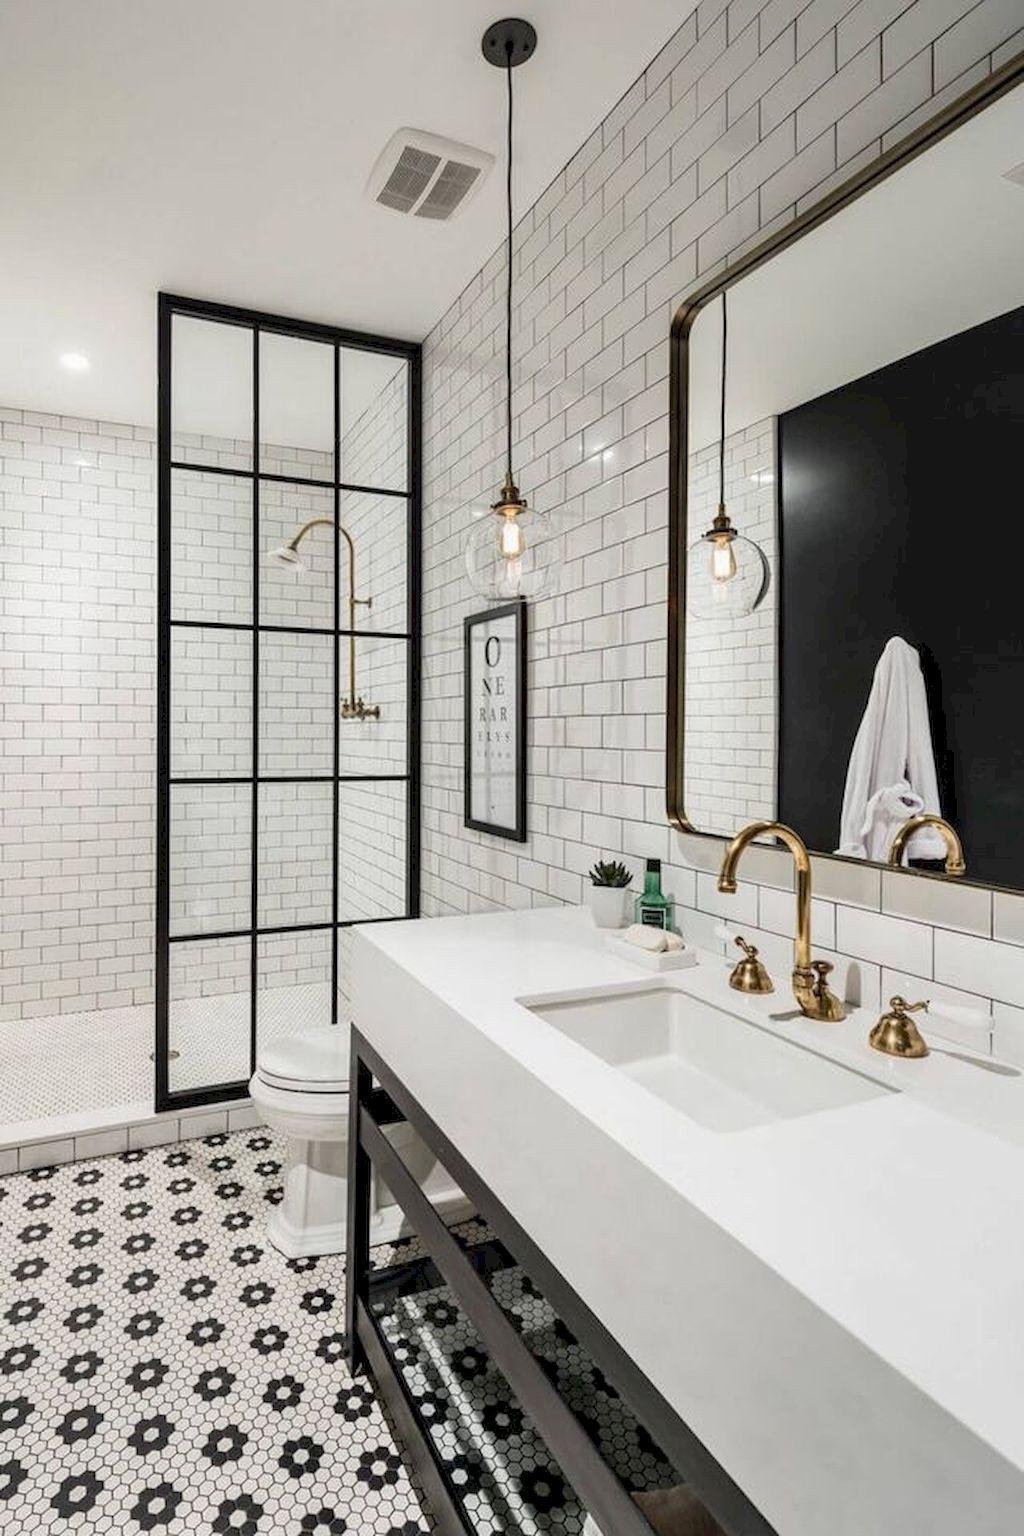 70 Small Bathroom Ideas Remodel For Apartment | Bathroom trends ...